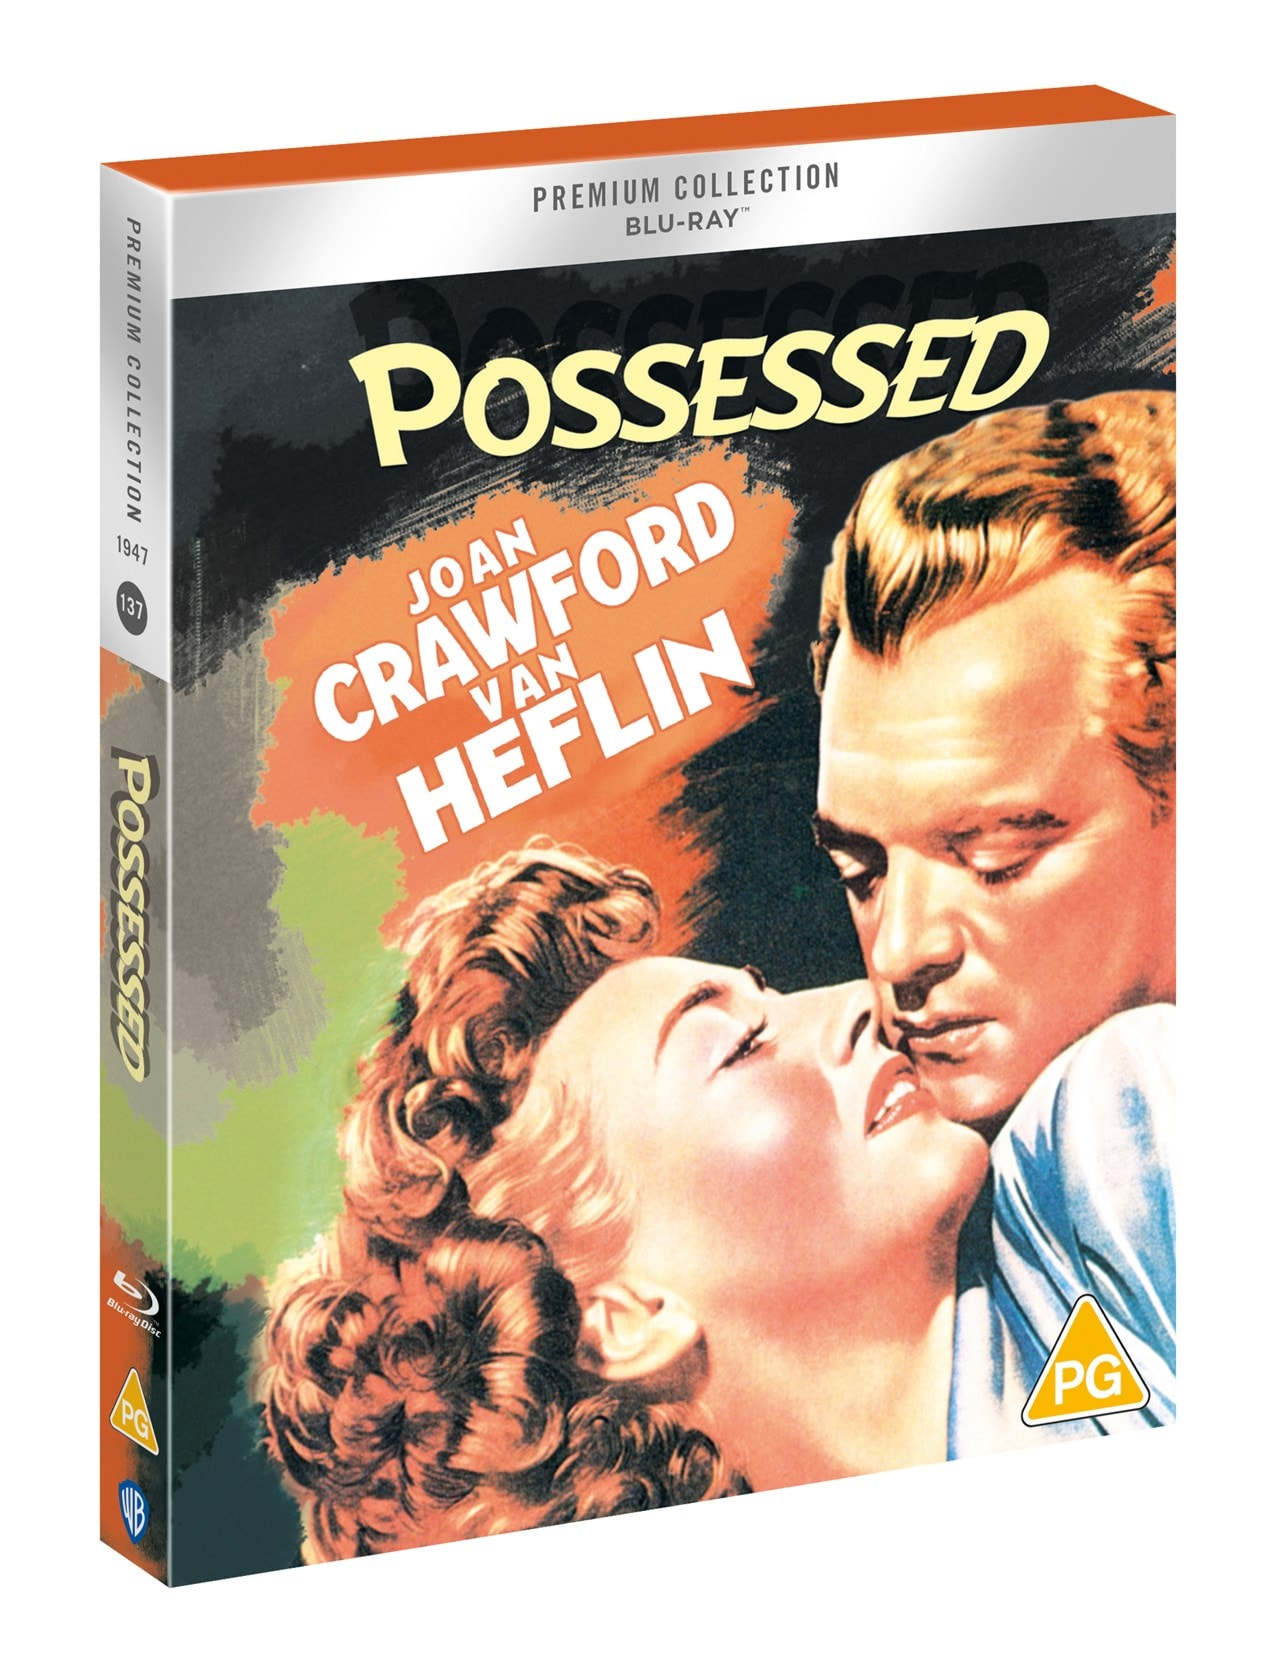 Possessed (hmv Exclusive) - The Premium Collection - 3